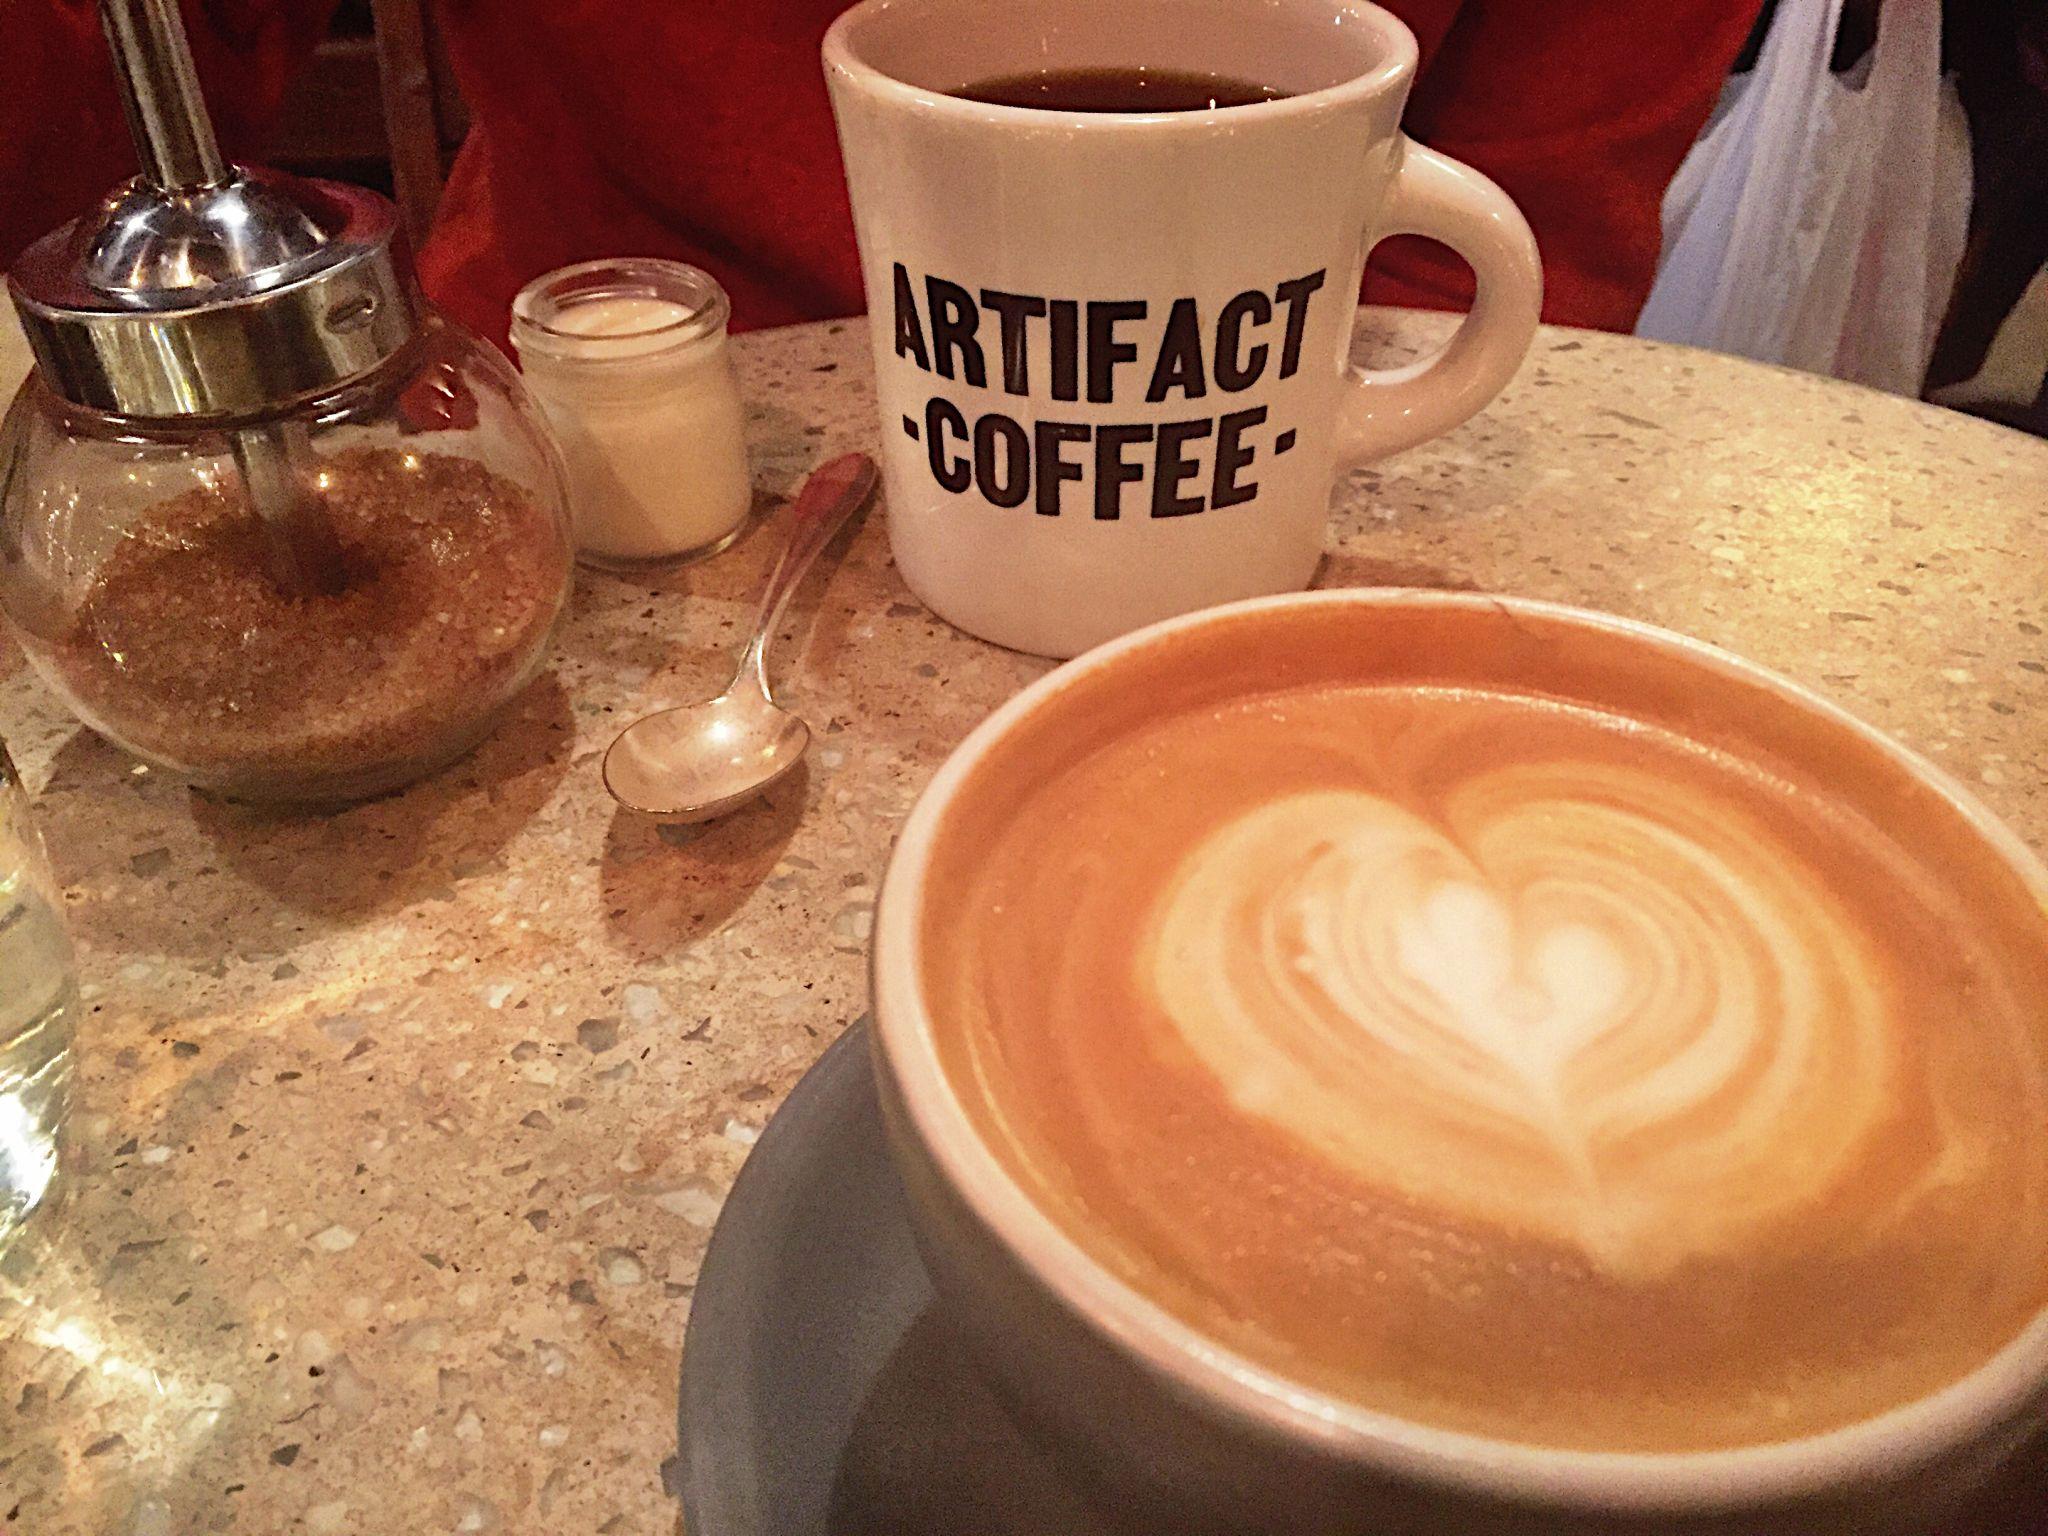 Artifact Coffee Coffee